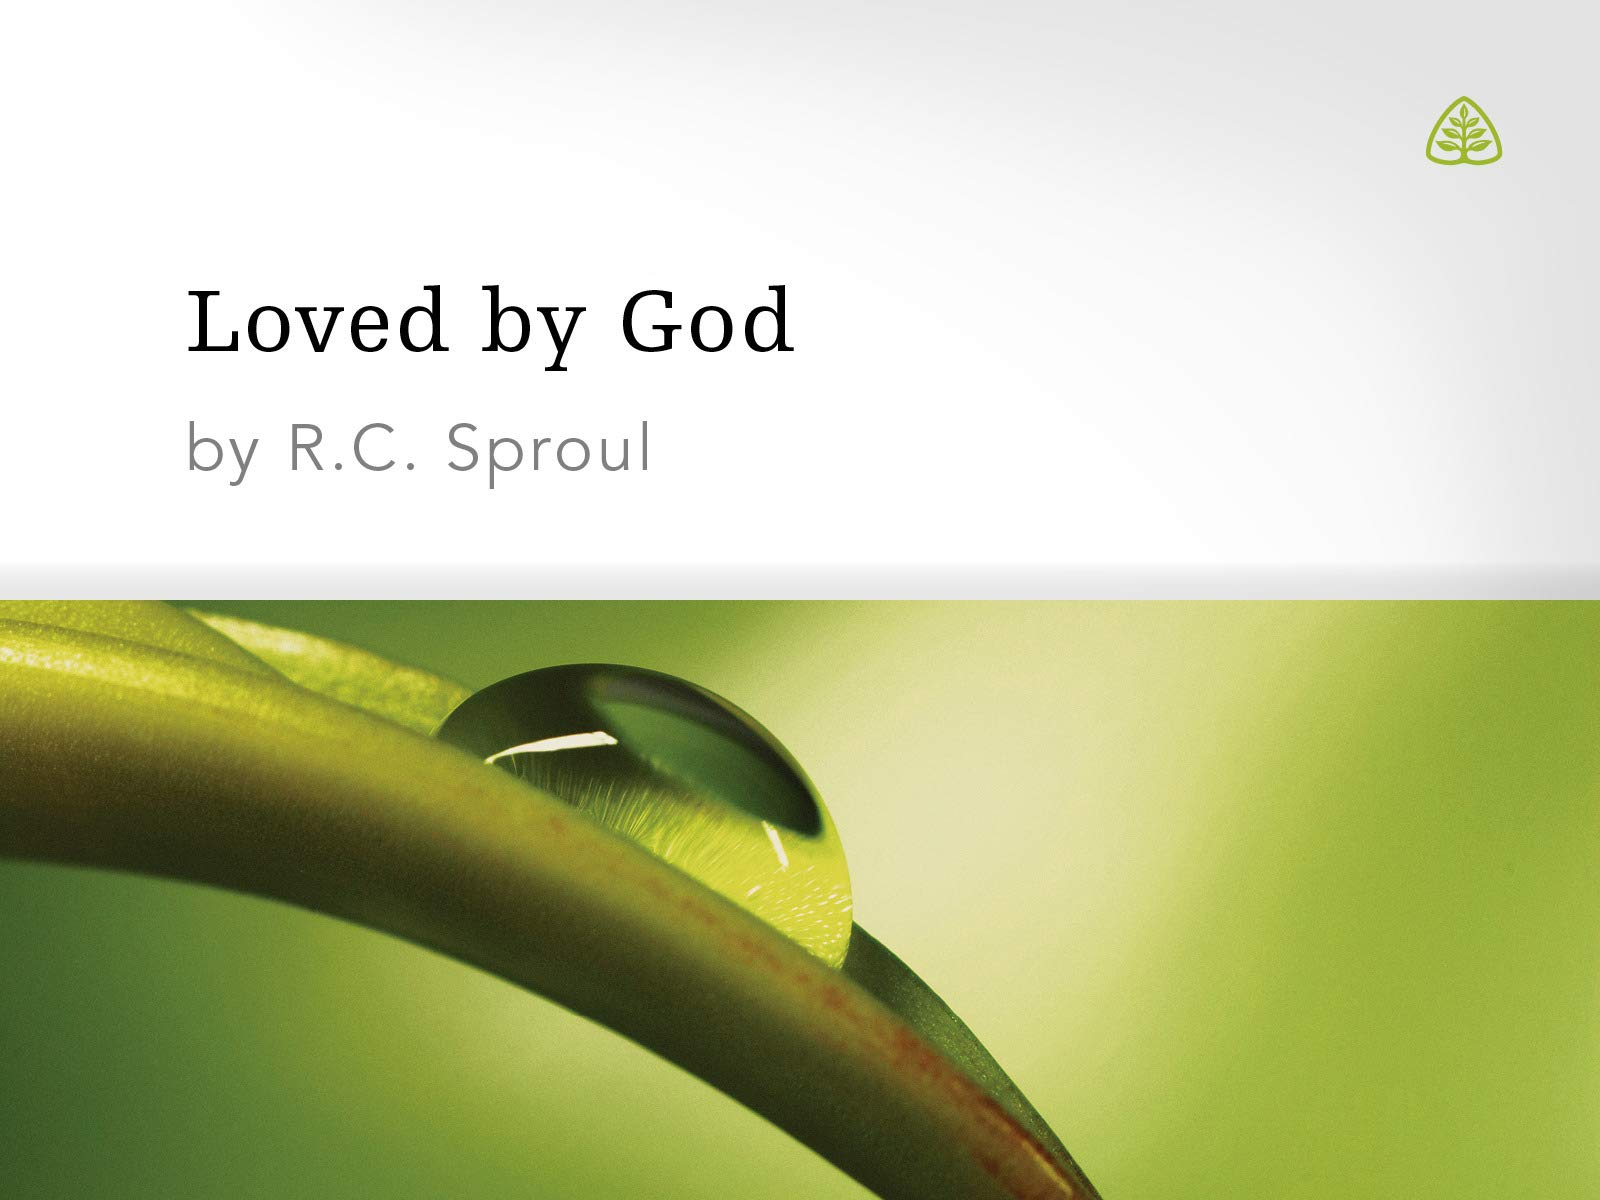 Loved by God - Season 1